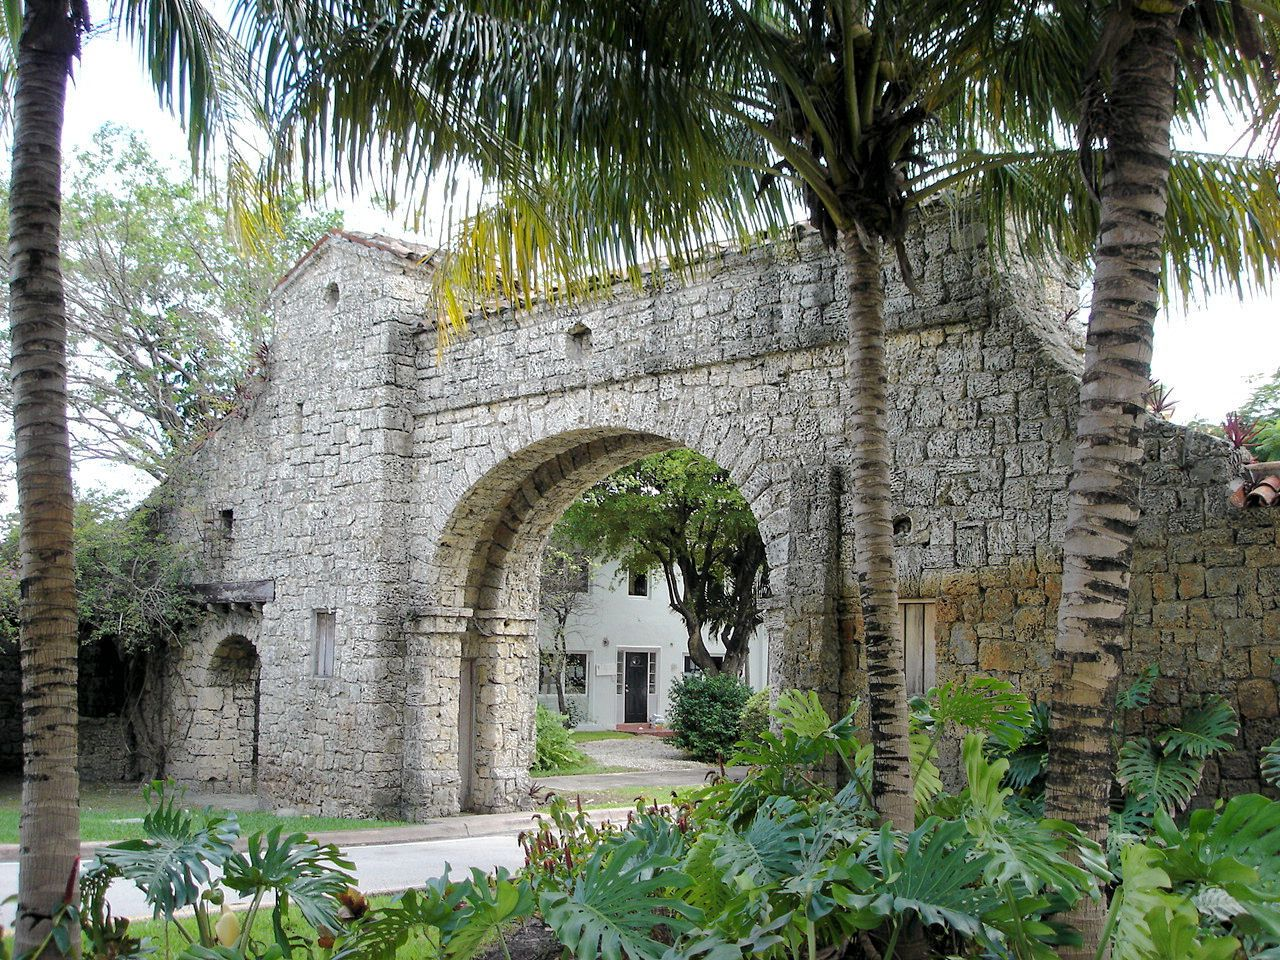 4b811475e1c40a274c65b591587507cc - Coral Gables Merrick House And Gardens